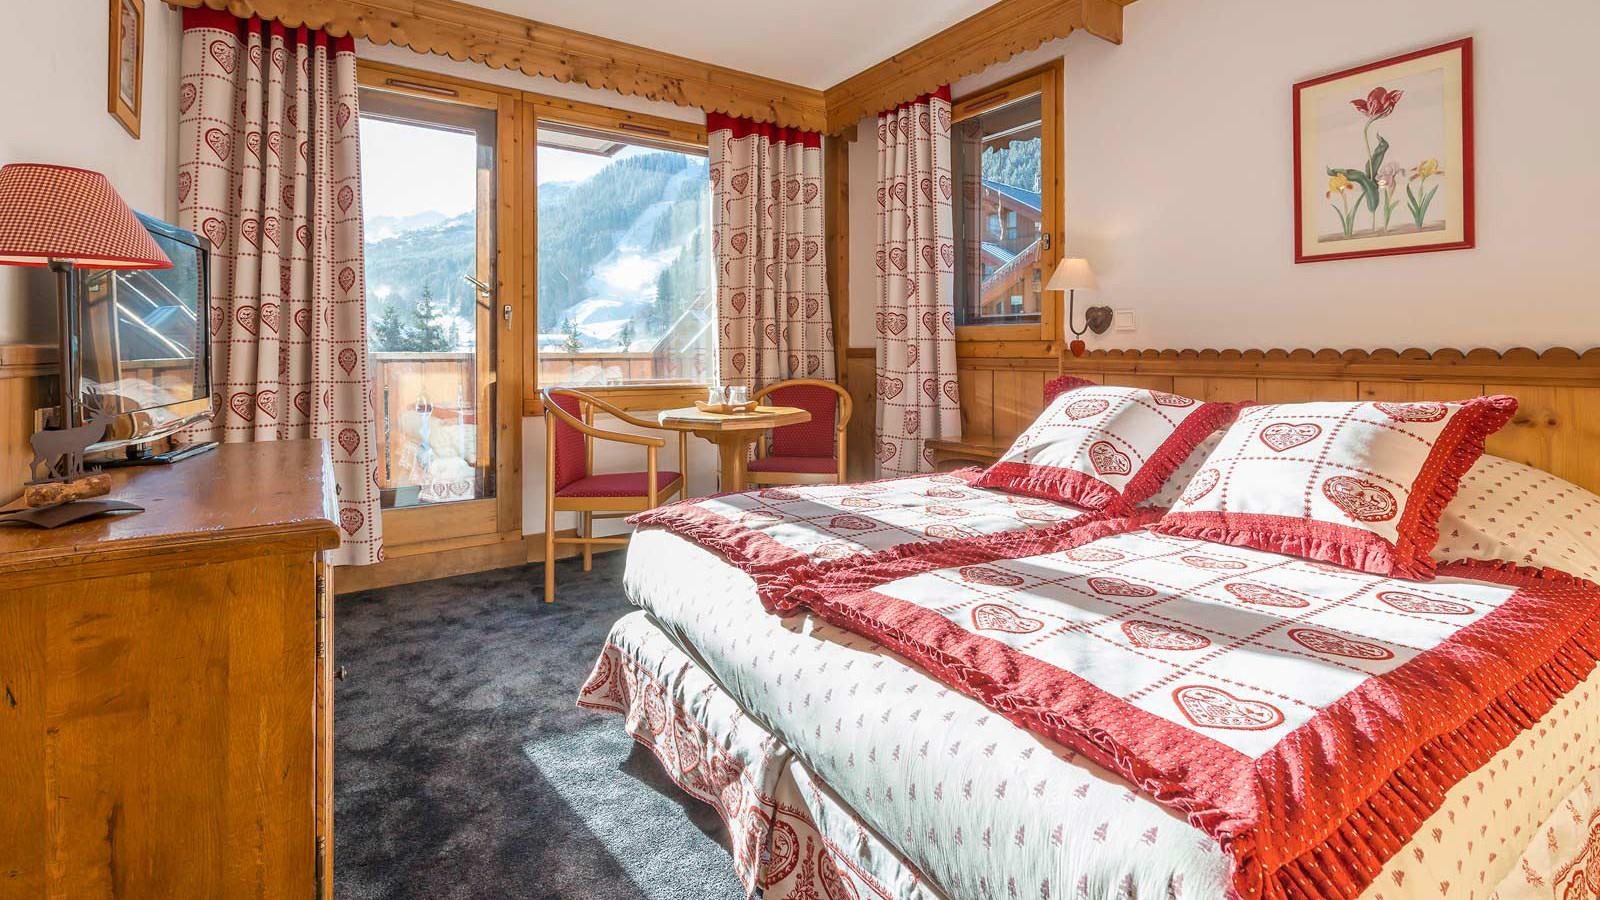 Hotel L'Eterlou, Meribel - Rooms